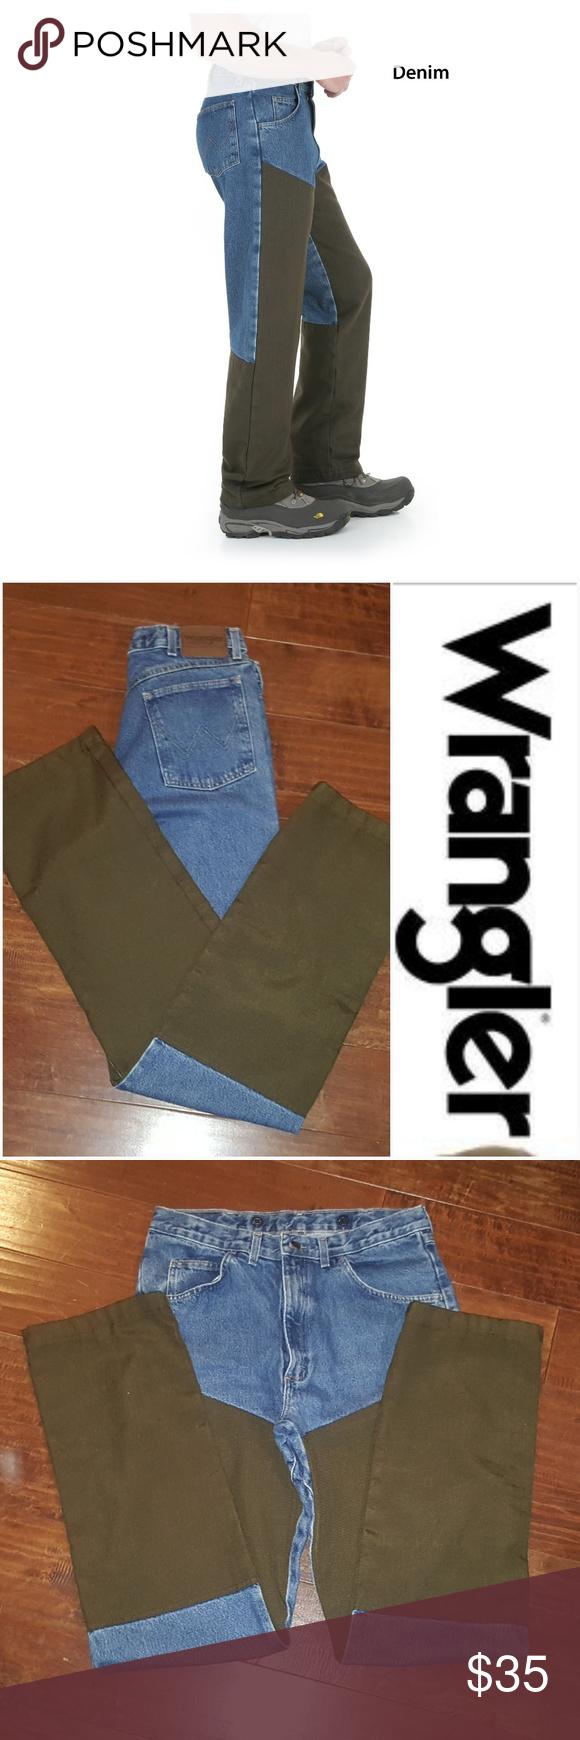 77c7b8d9 Loose Fit · Legs · Wrangler Pro-Gear Upland Blue/Brown Jeans □Wrangler  □Men's 34W x 36L